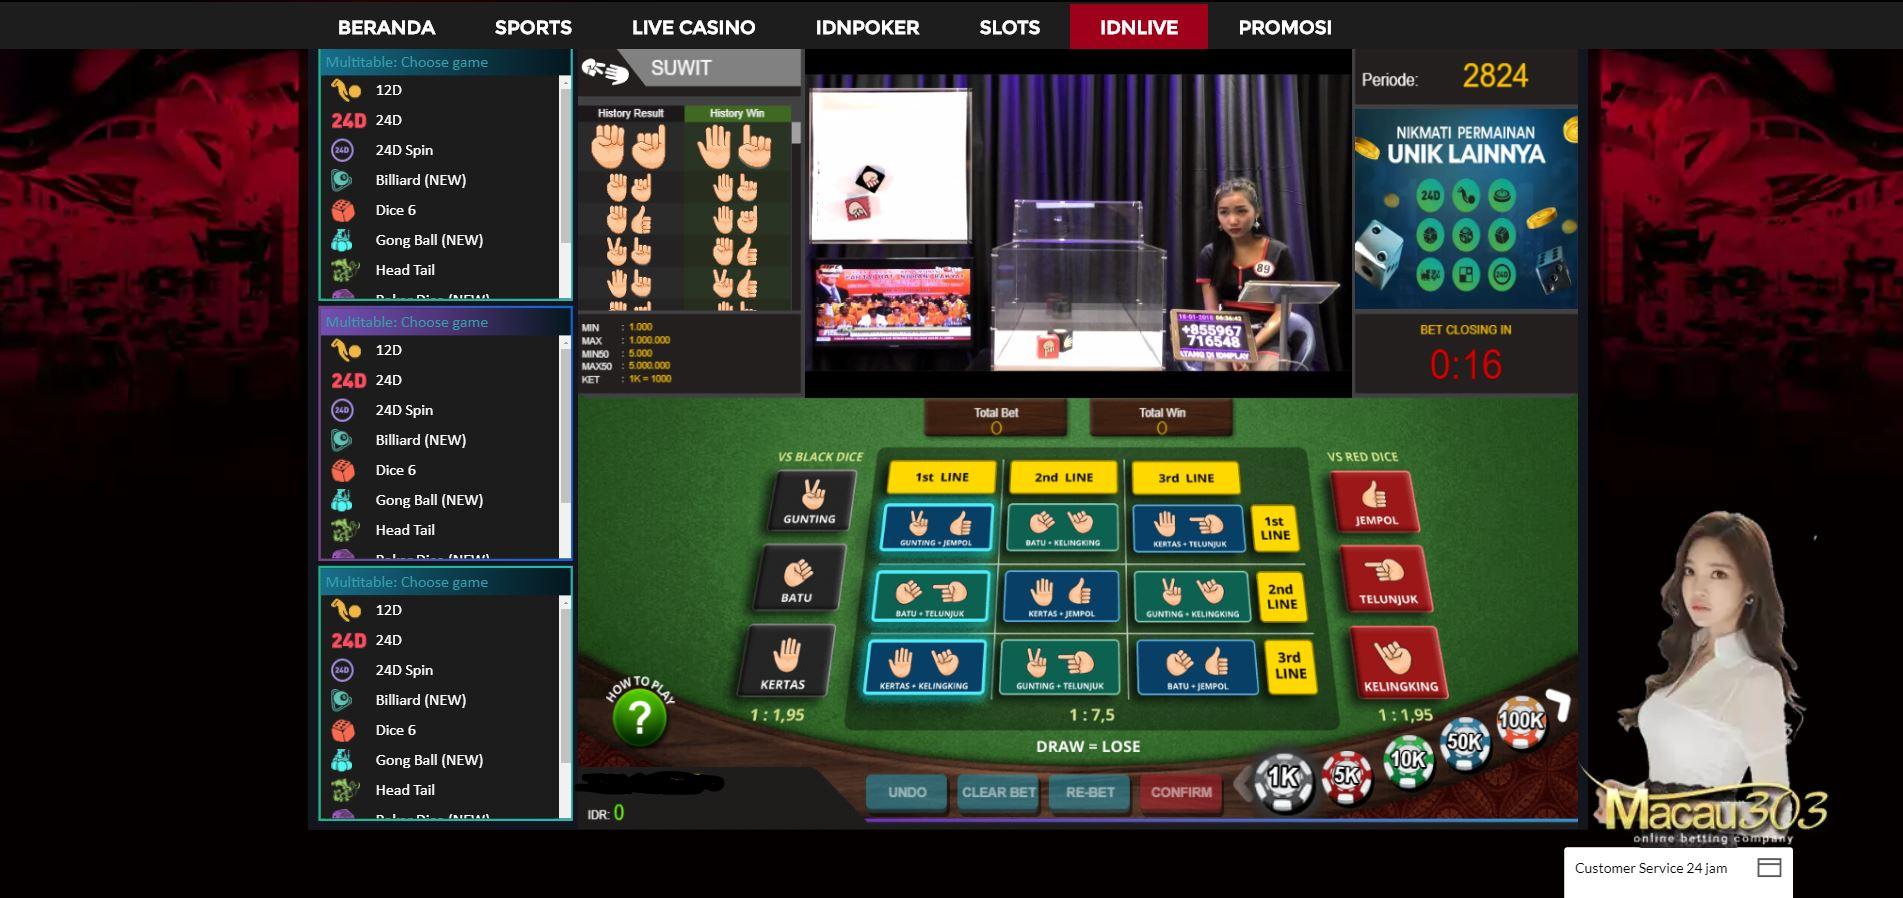 Tampilan Permainan Judi Dadu Suwit di Macau303